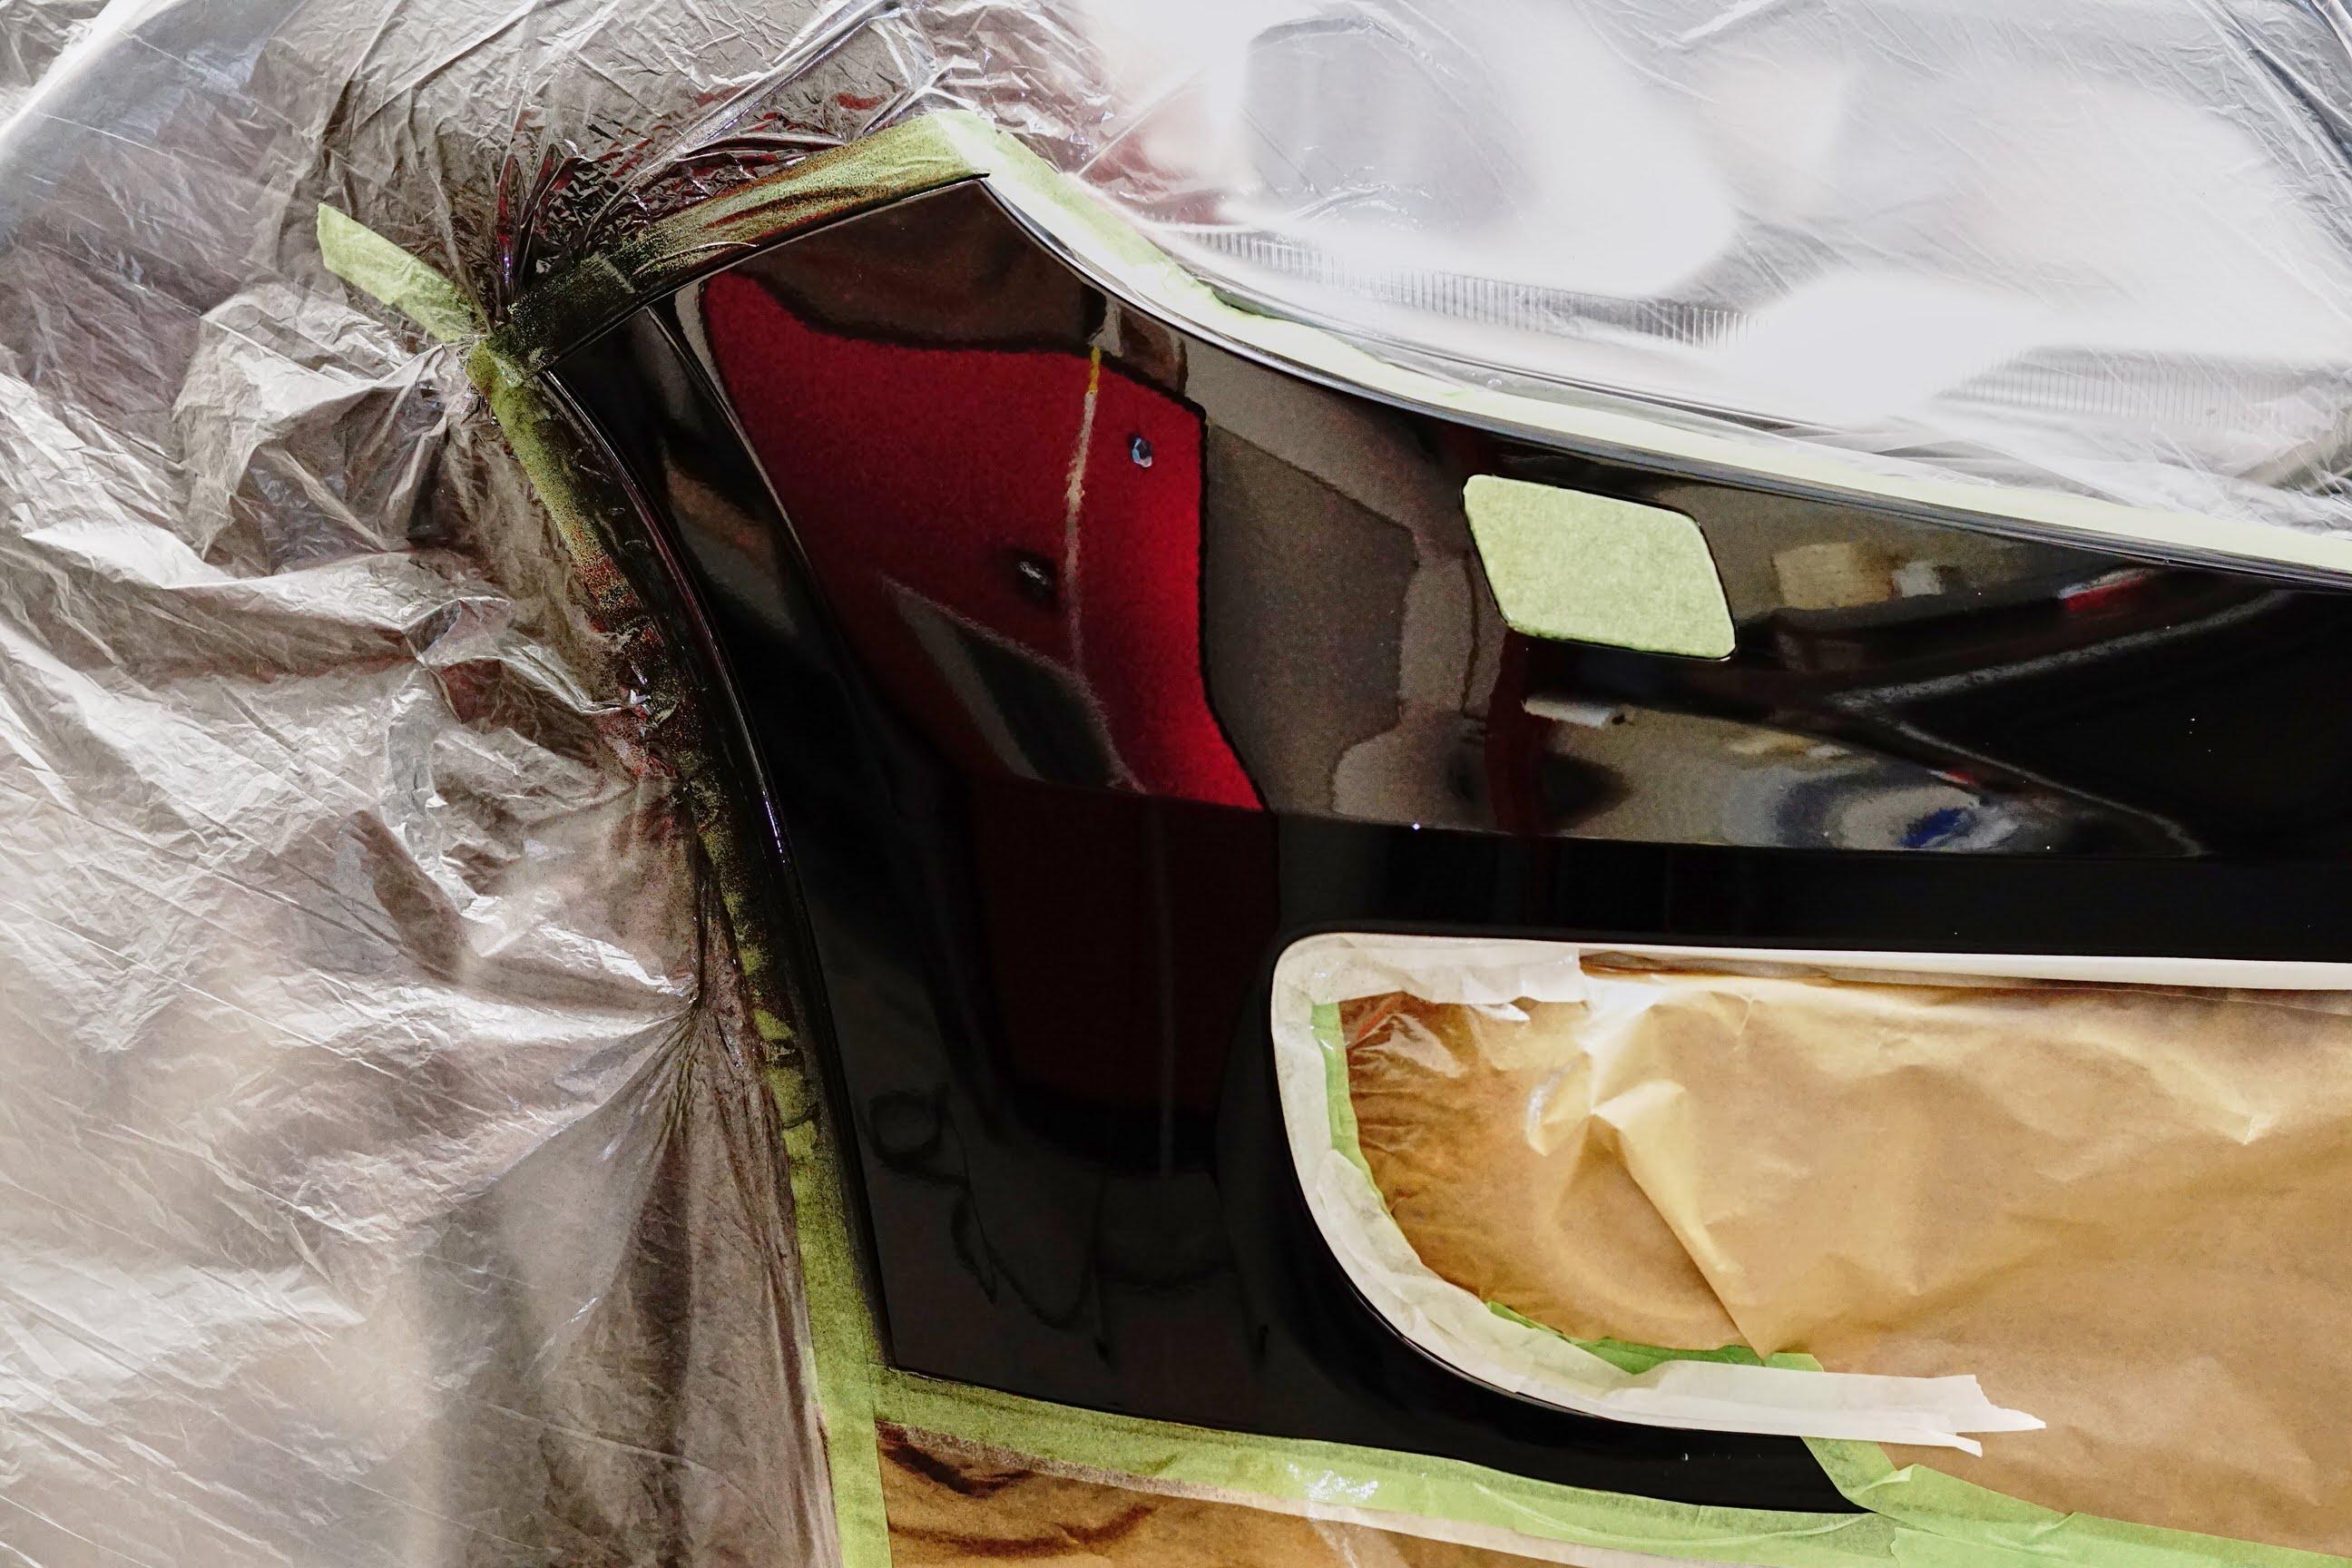 smart repair lacksch den ausbessern lack beulendoktor. Black Bedroom Furniture Sets. Home Design Ideas